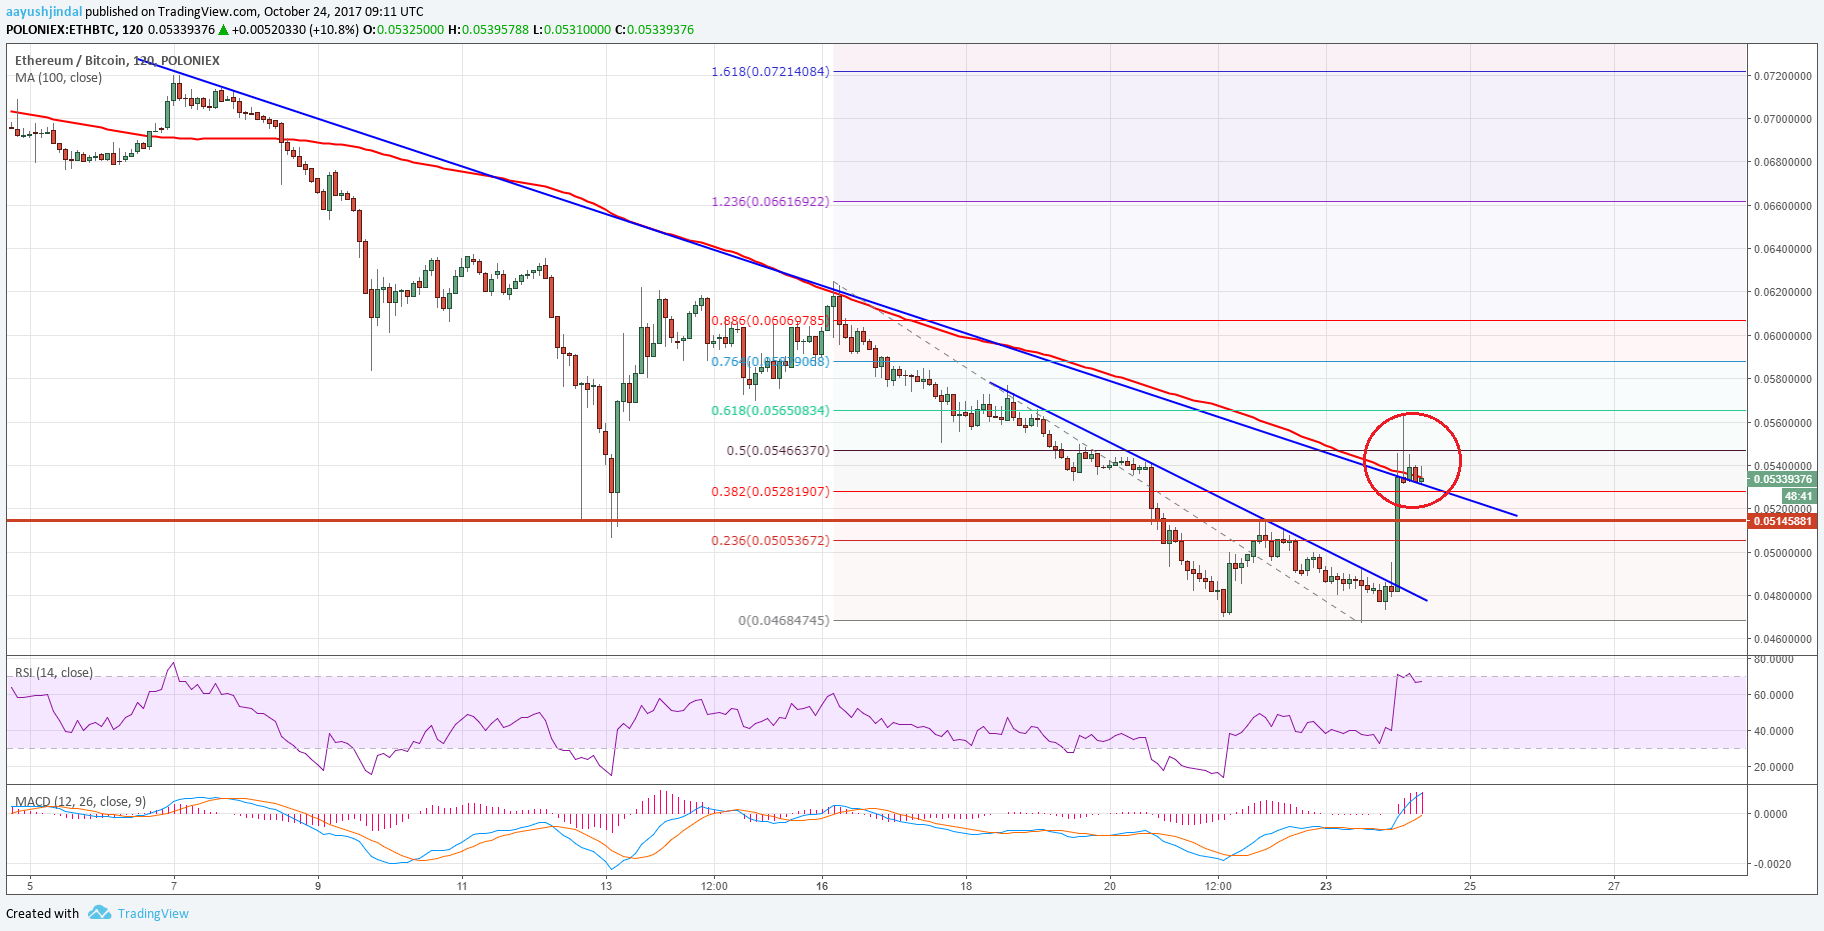 ETH/BTC Forecast: Can Ethereum Gain Momentum?